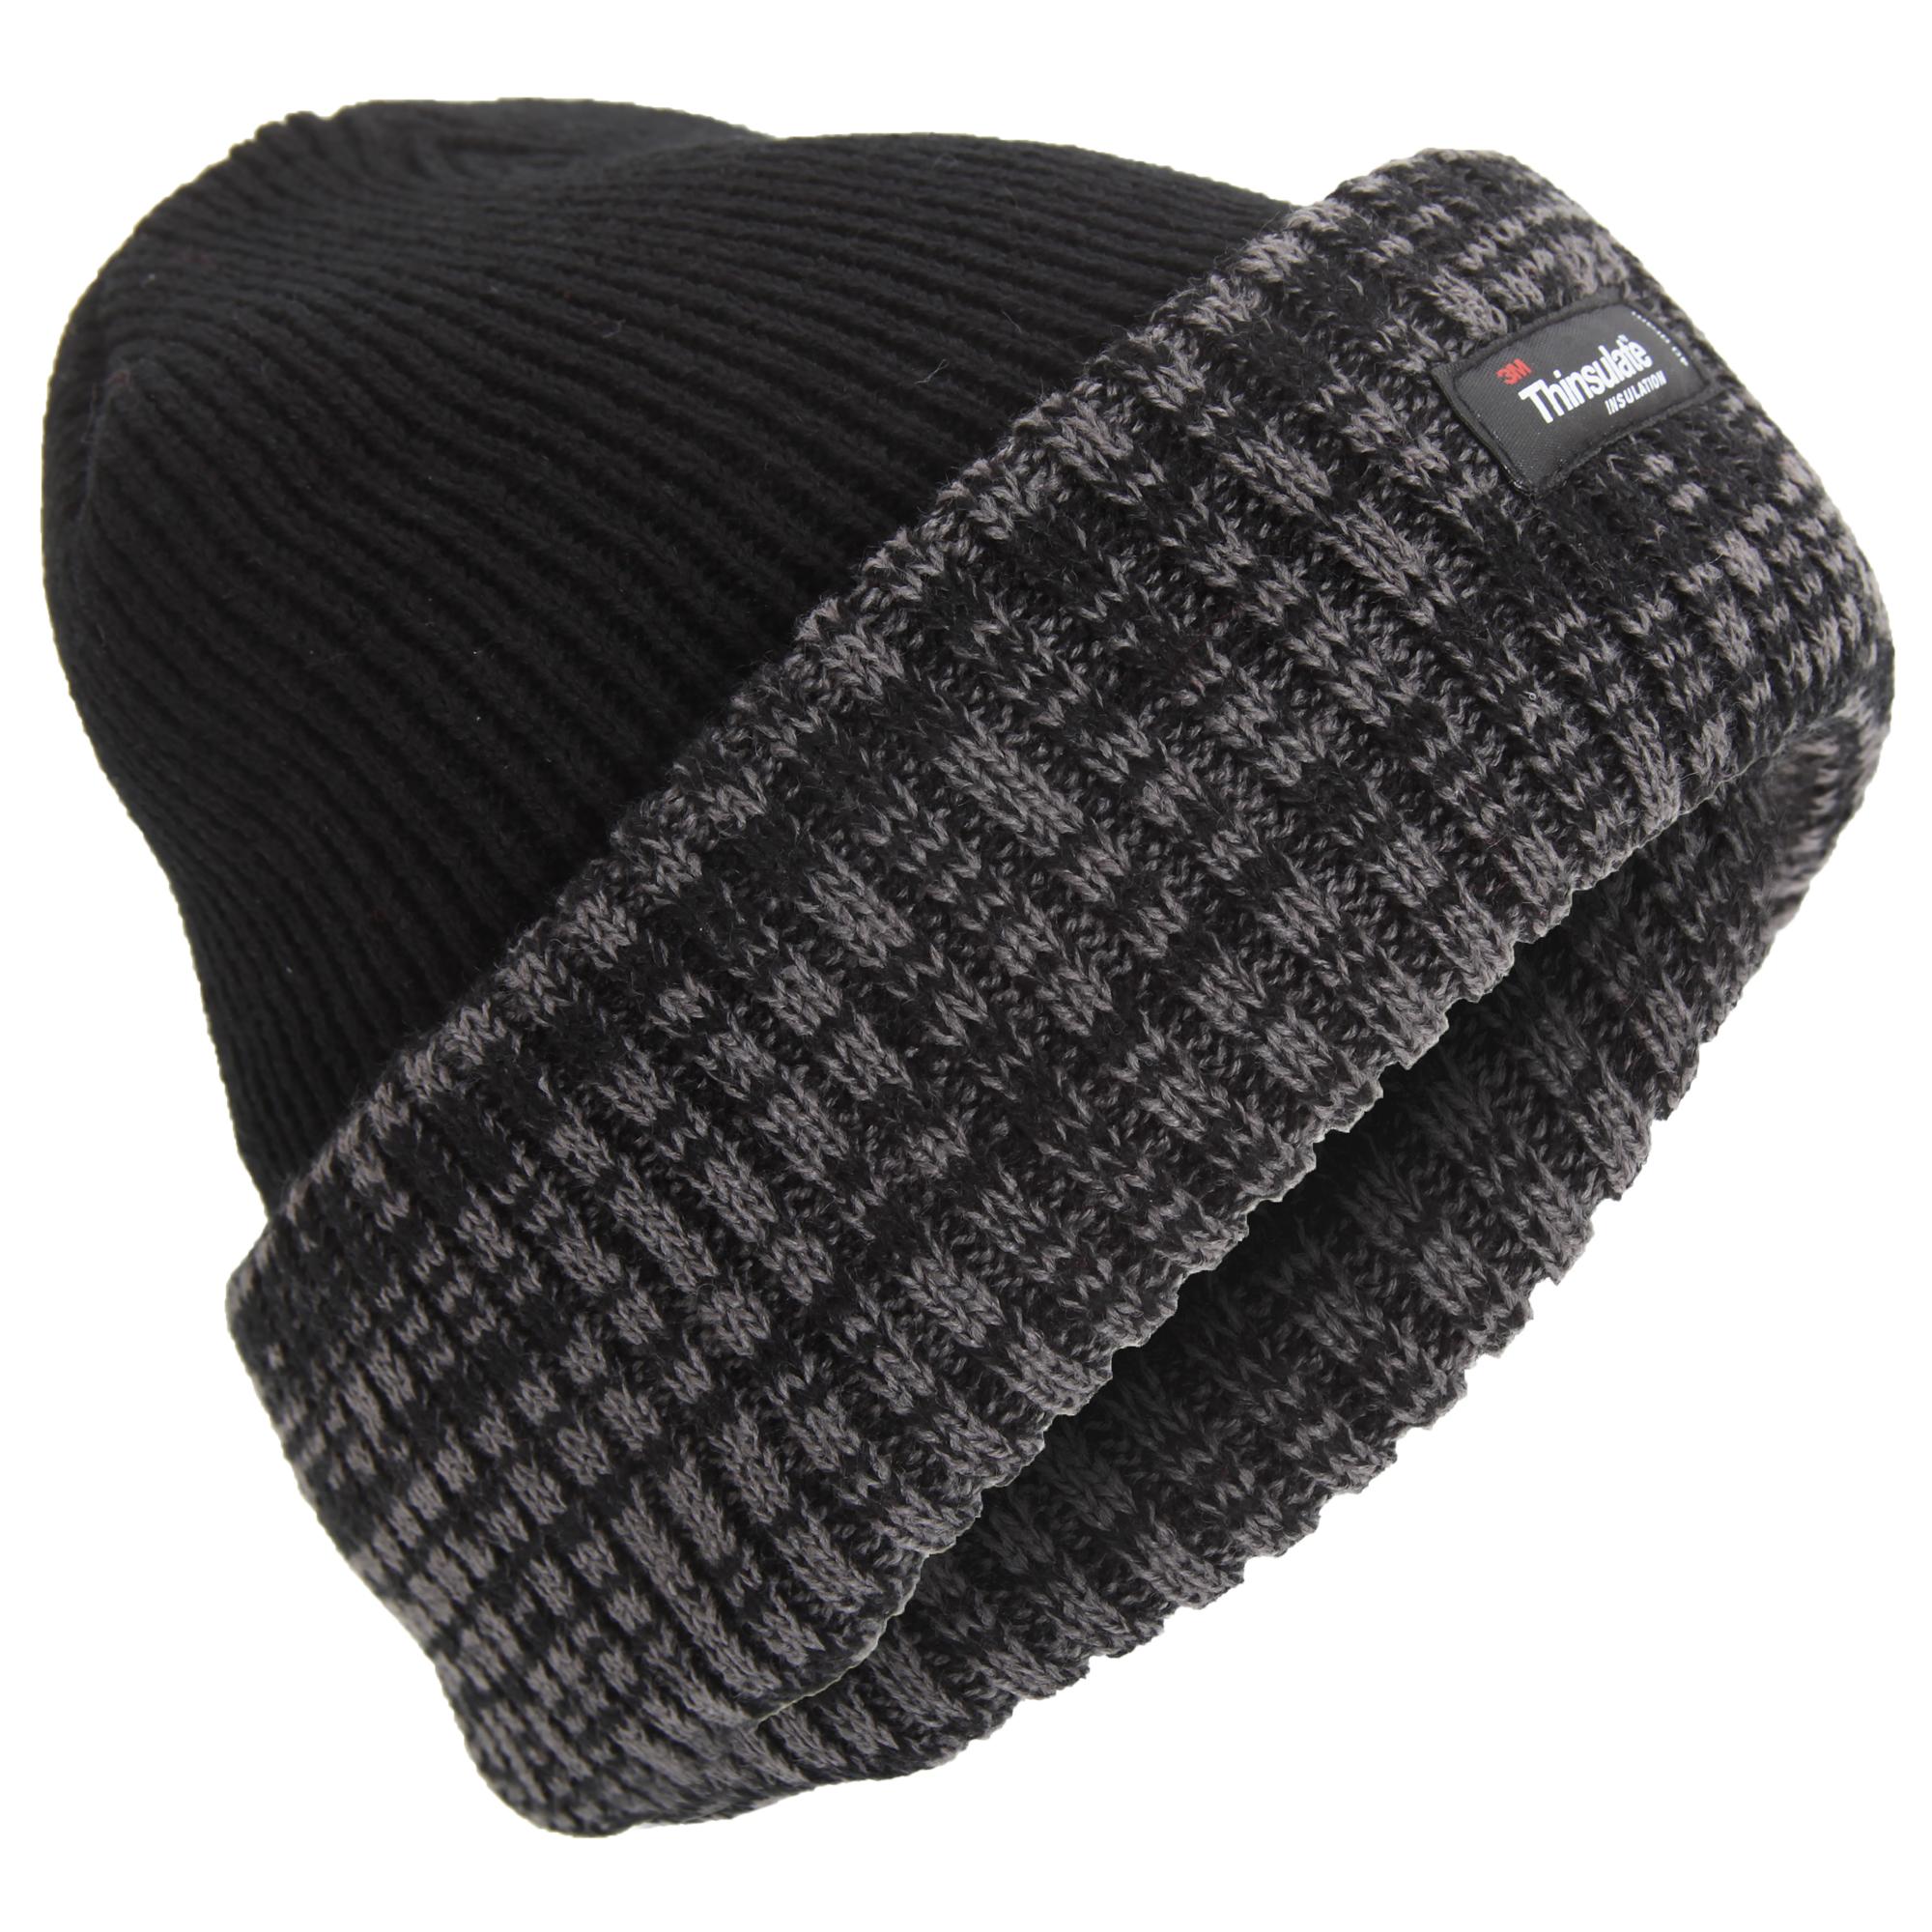 771038f5b79 Mens Thinsulate Thermal Knit Winter Beanie Hat (3M 40g) (HA539)